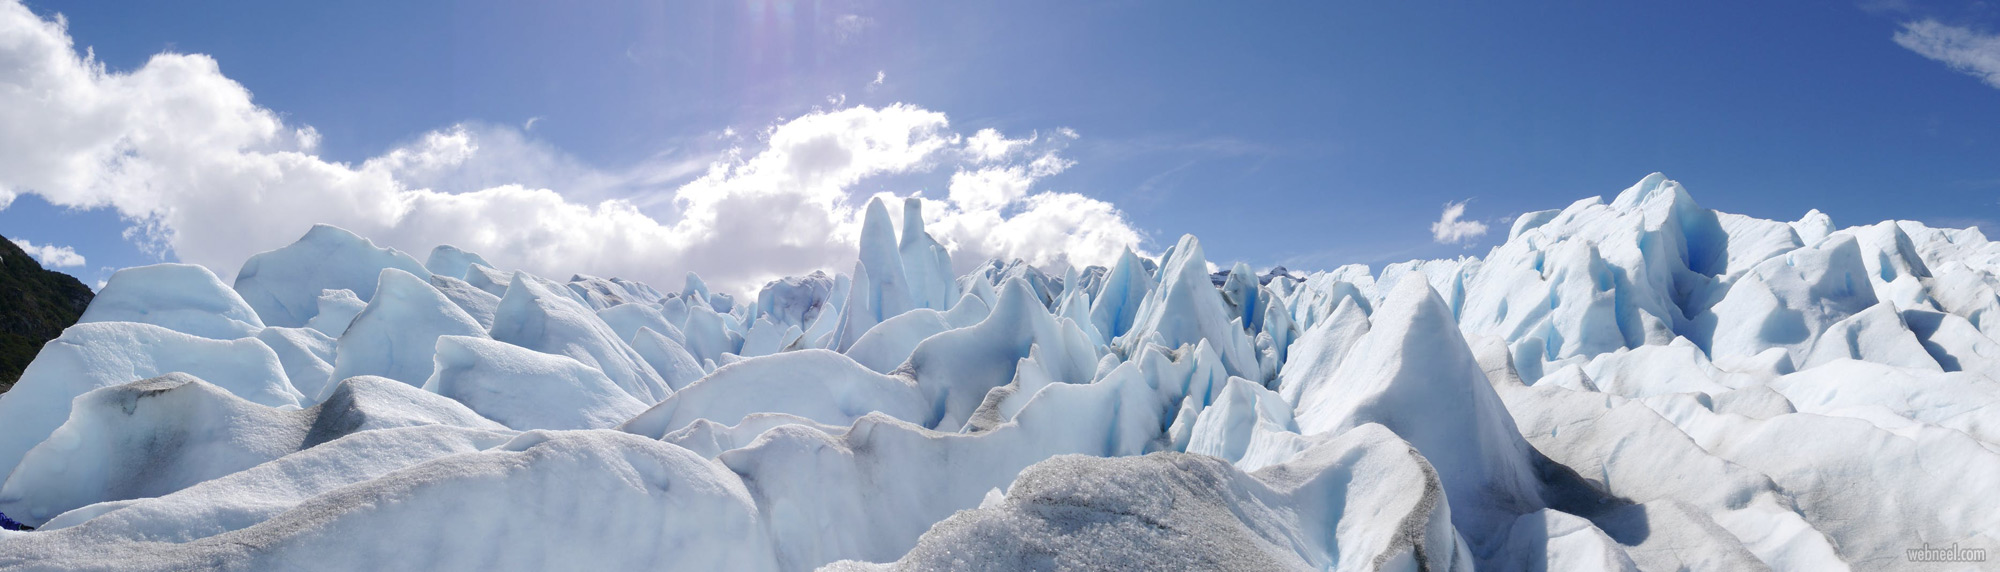 panoramic photography ice